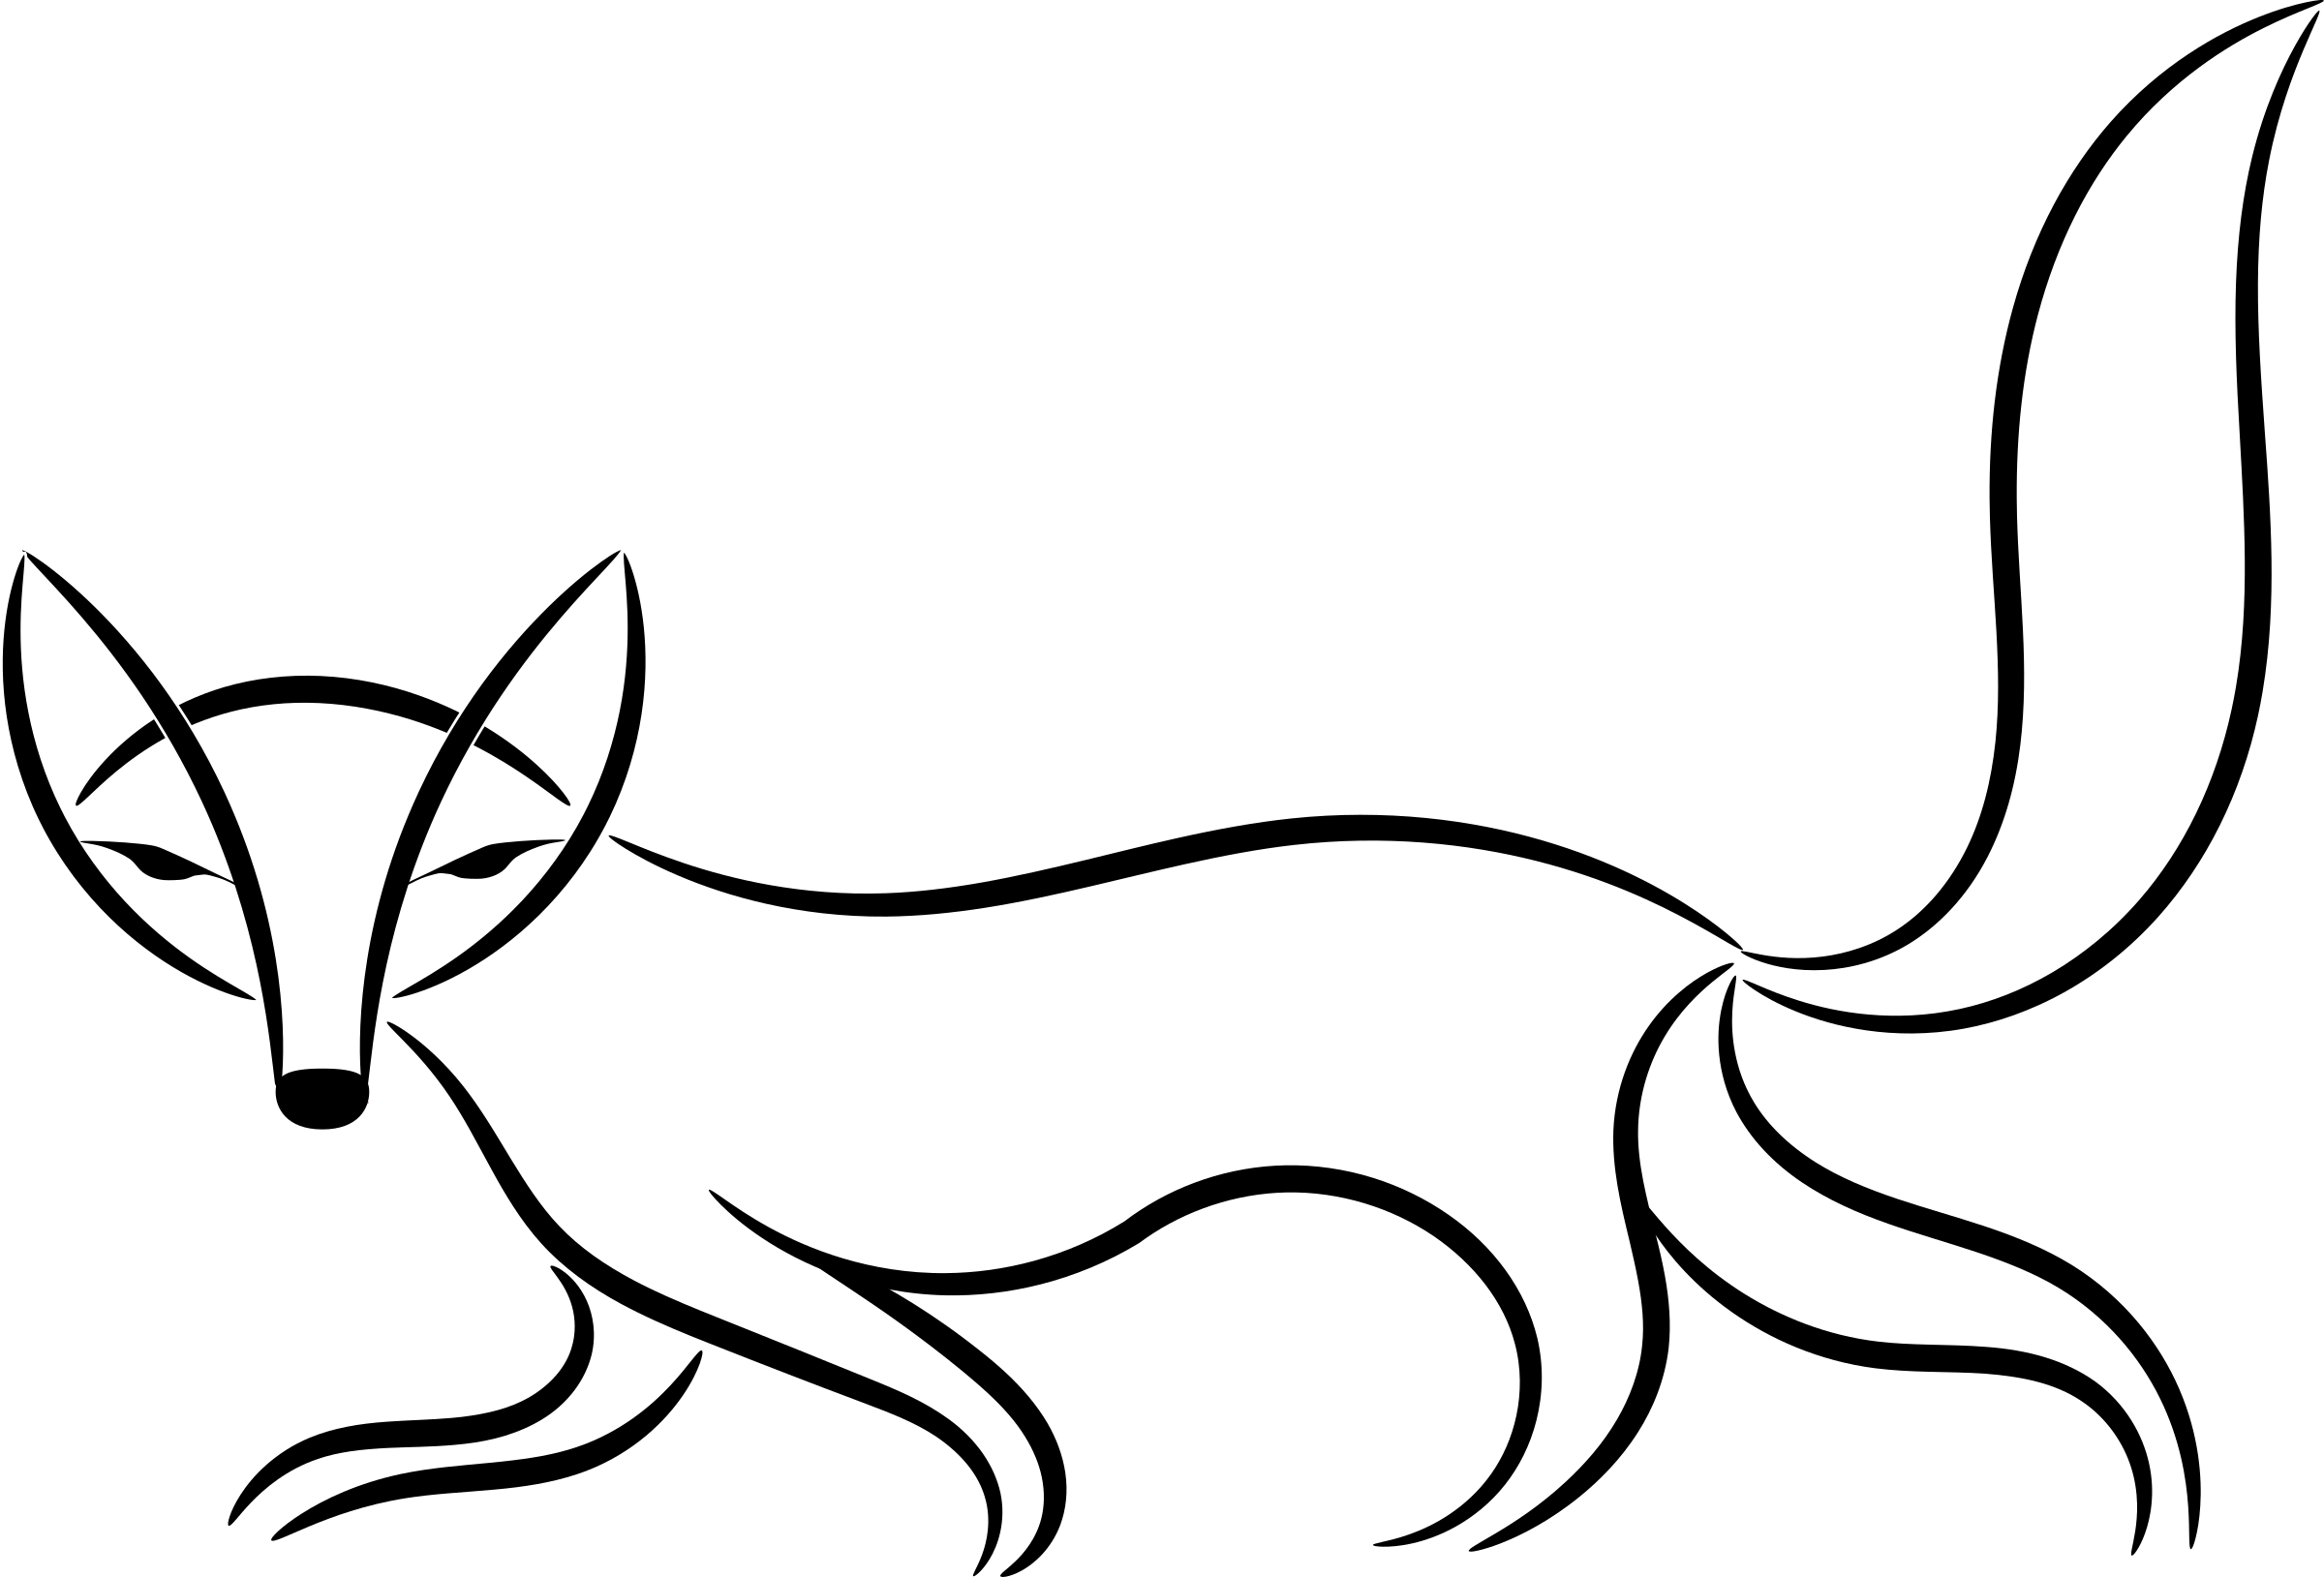 2400x1629 Fox Clipart Transparent Background